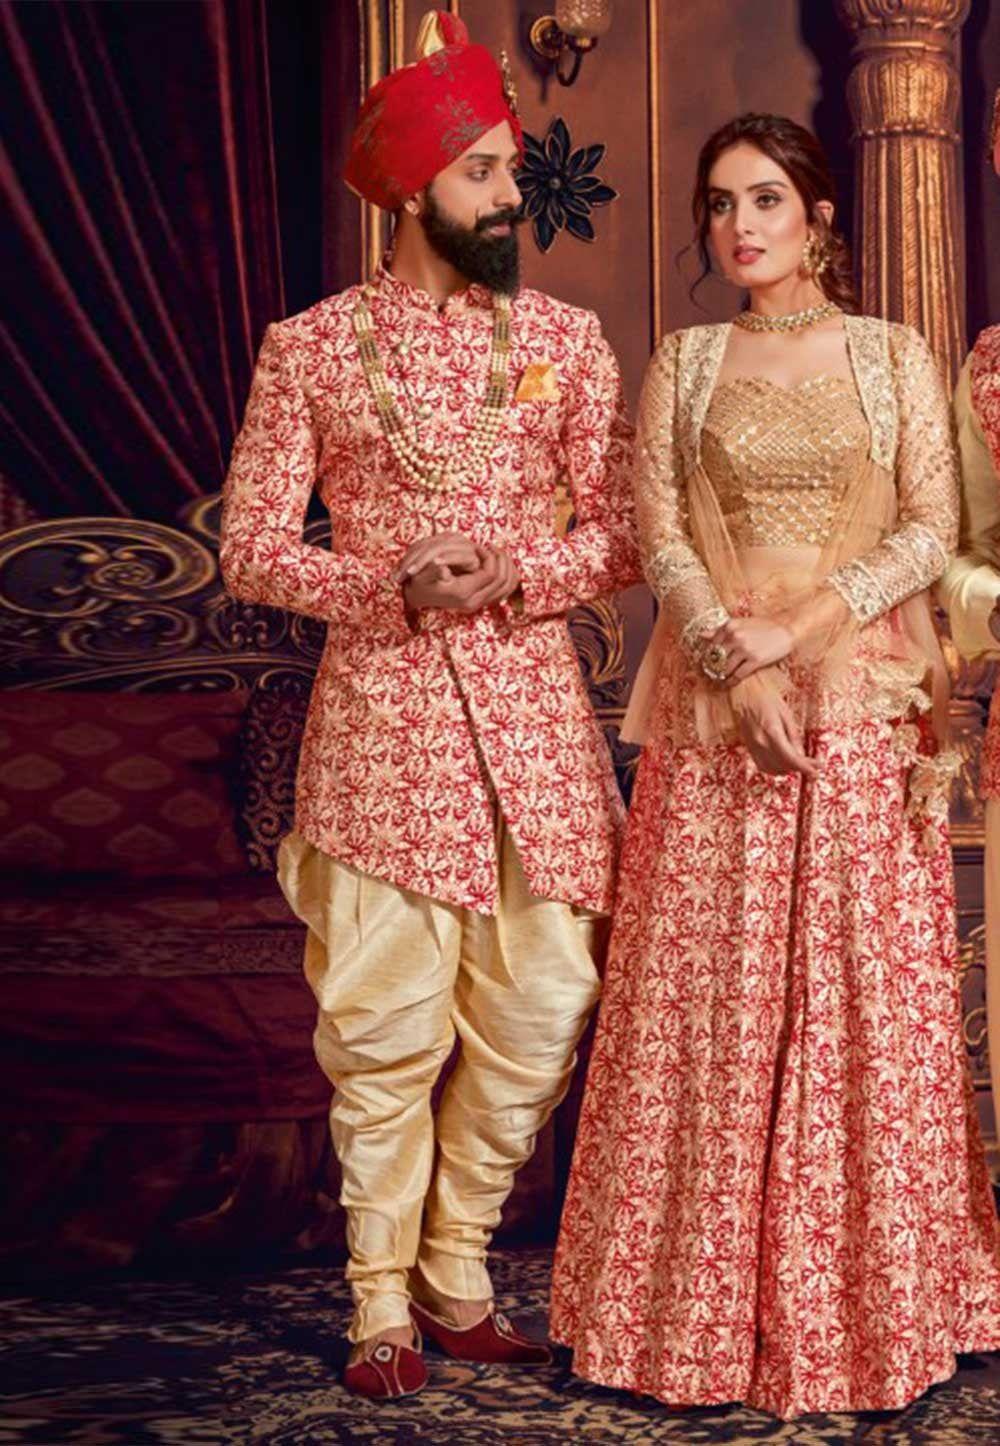 Designer Indowestern Sherwani Indowestern For Men Wedding Dress For Men Indian Wedding Dres Wedding Dress Men Wedding Dresses Men Indian Indian Wedding Outfits [ 1446 x 1000 Pixel ]